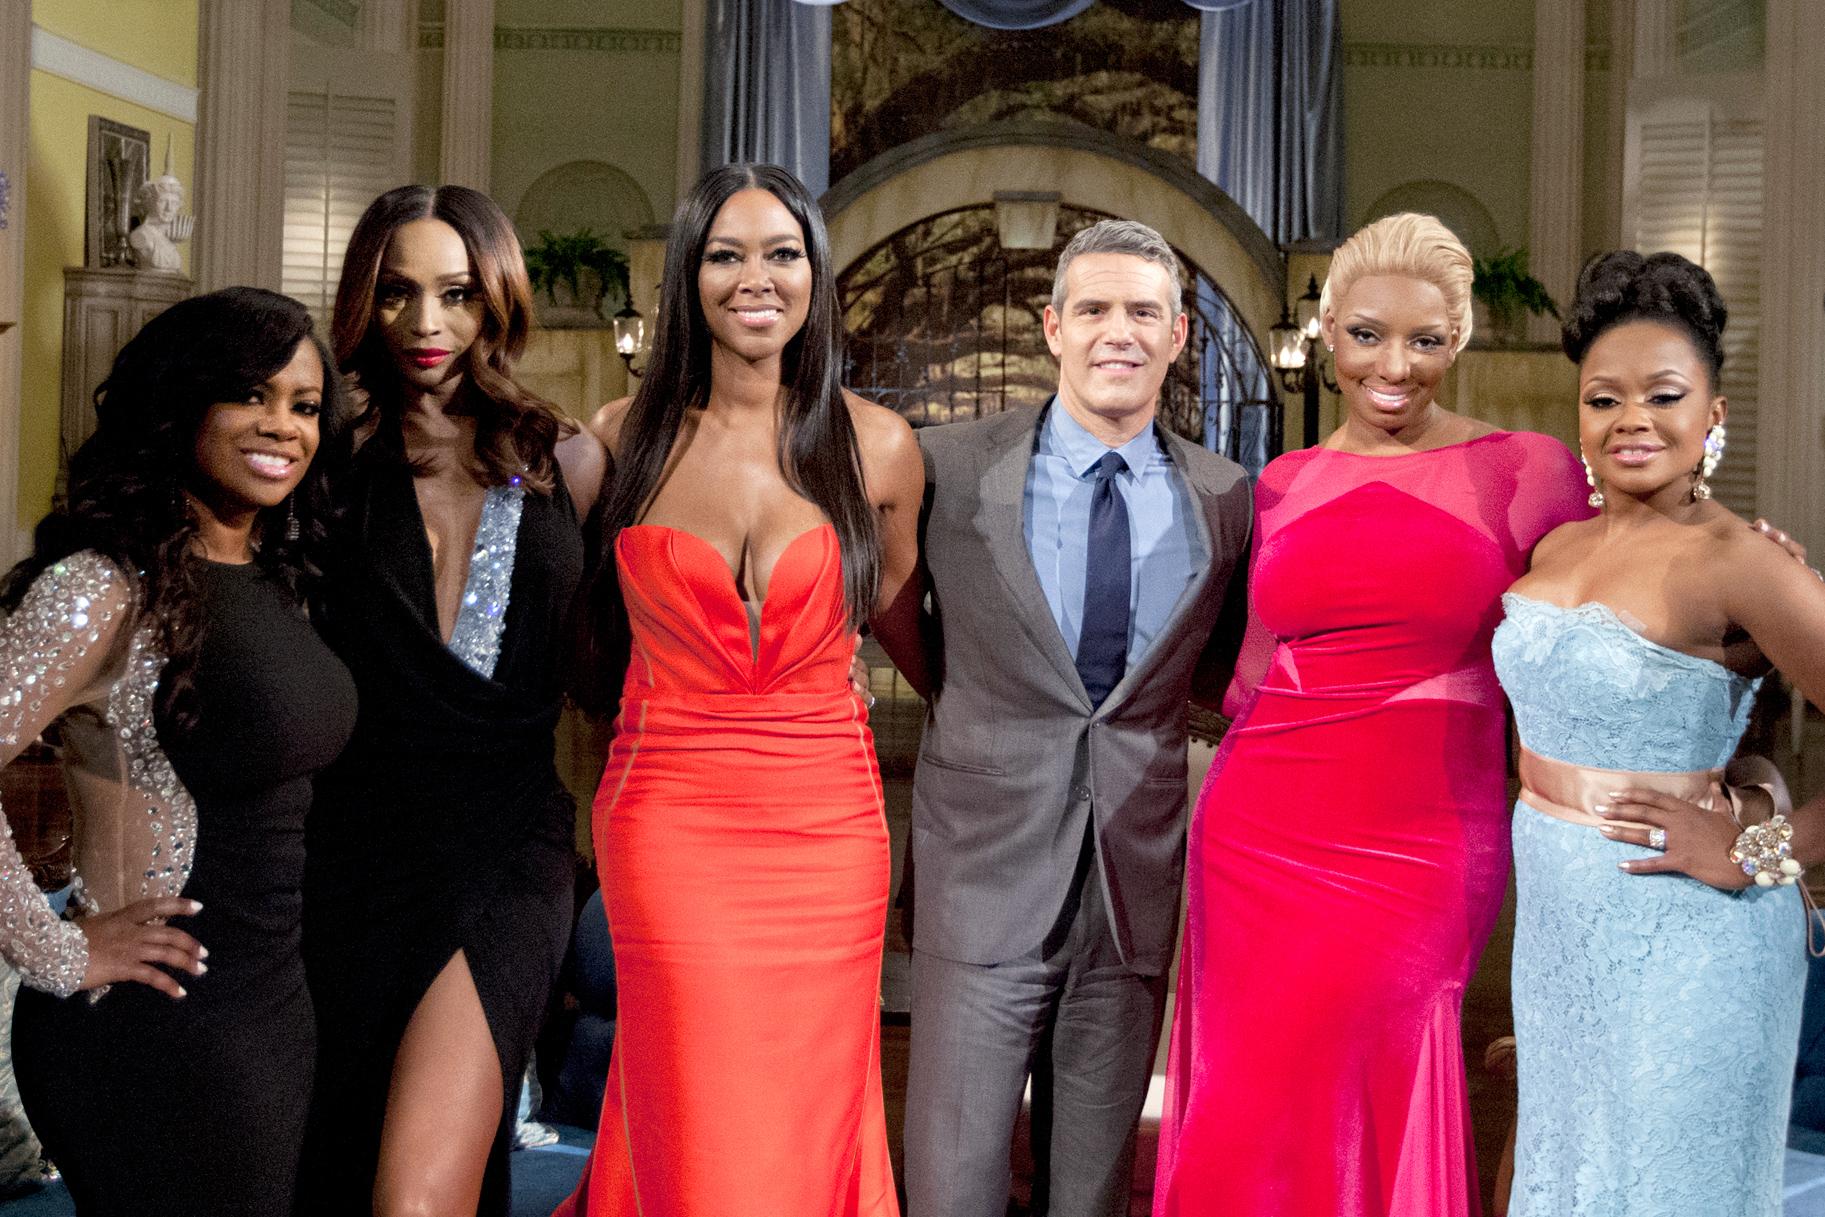 real-housewives-of-atlanta-season-6-reunion-43